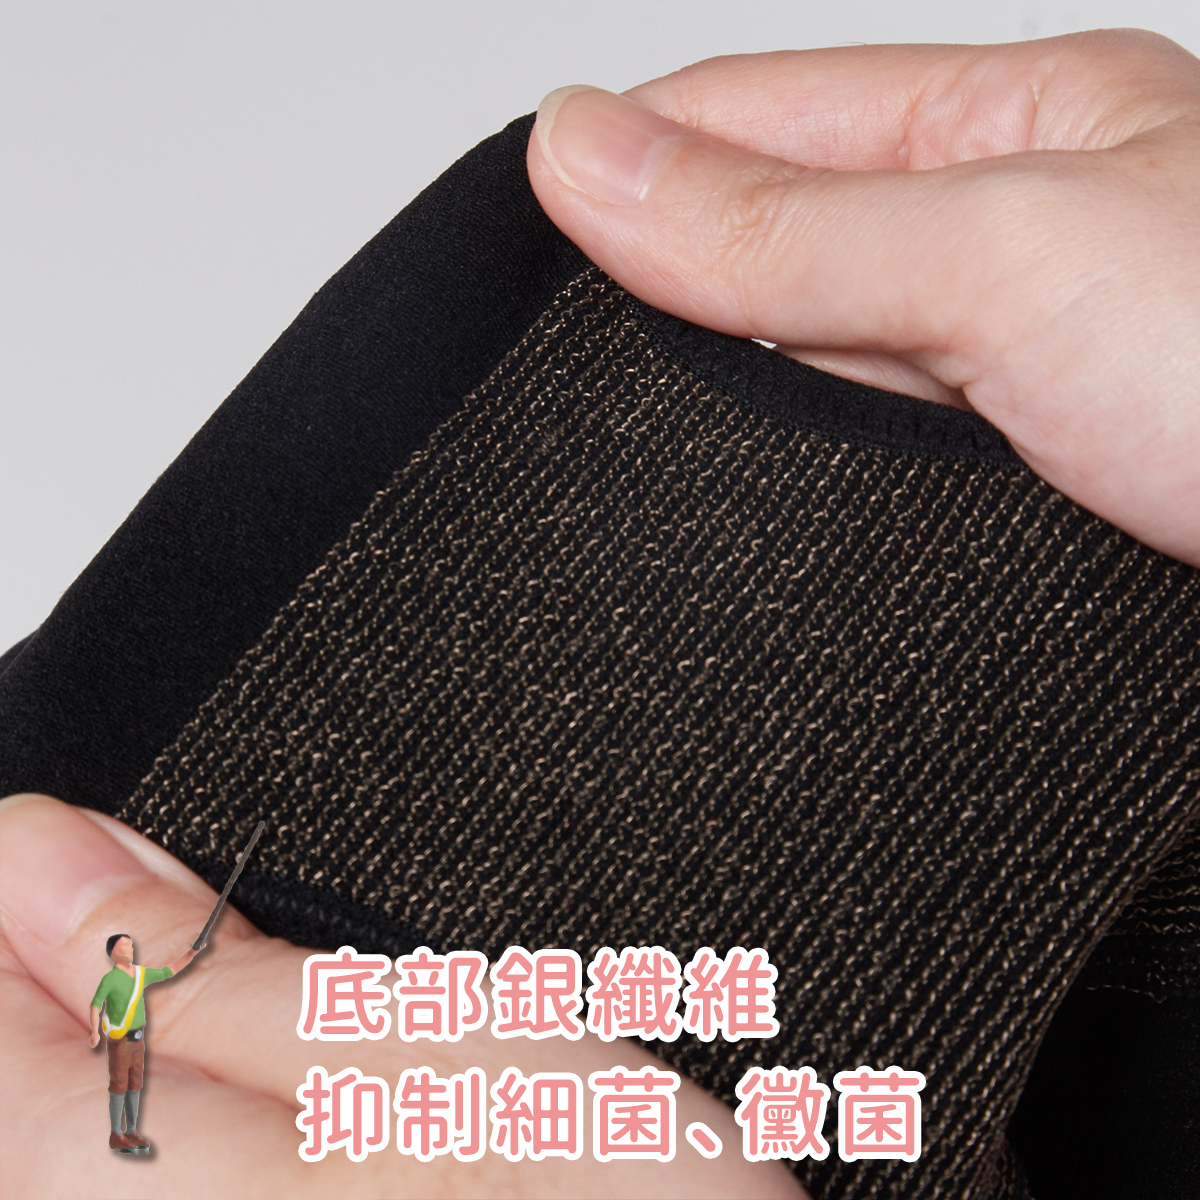 【AREX SPORT】抗菌消臭 銀纖維內褲(台灣製、女款)4